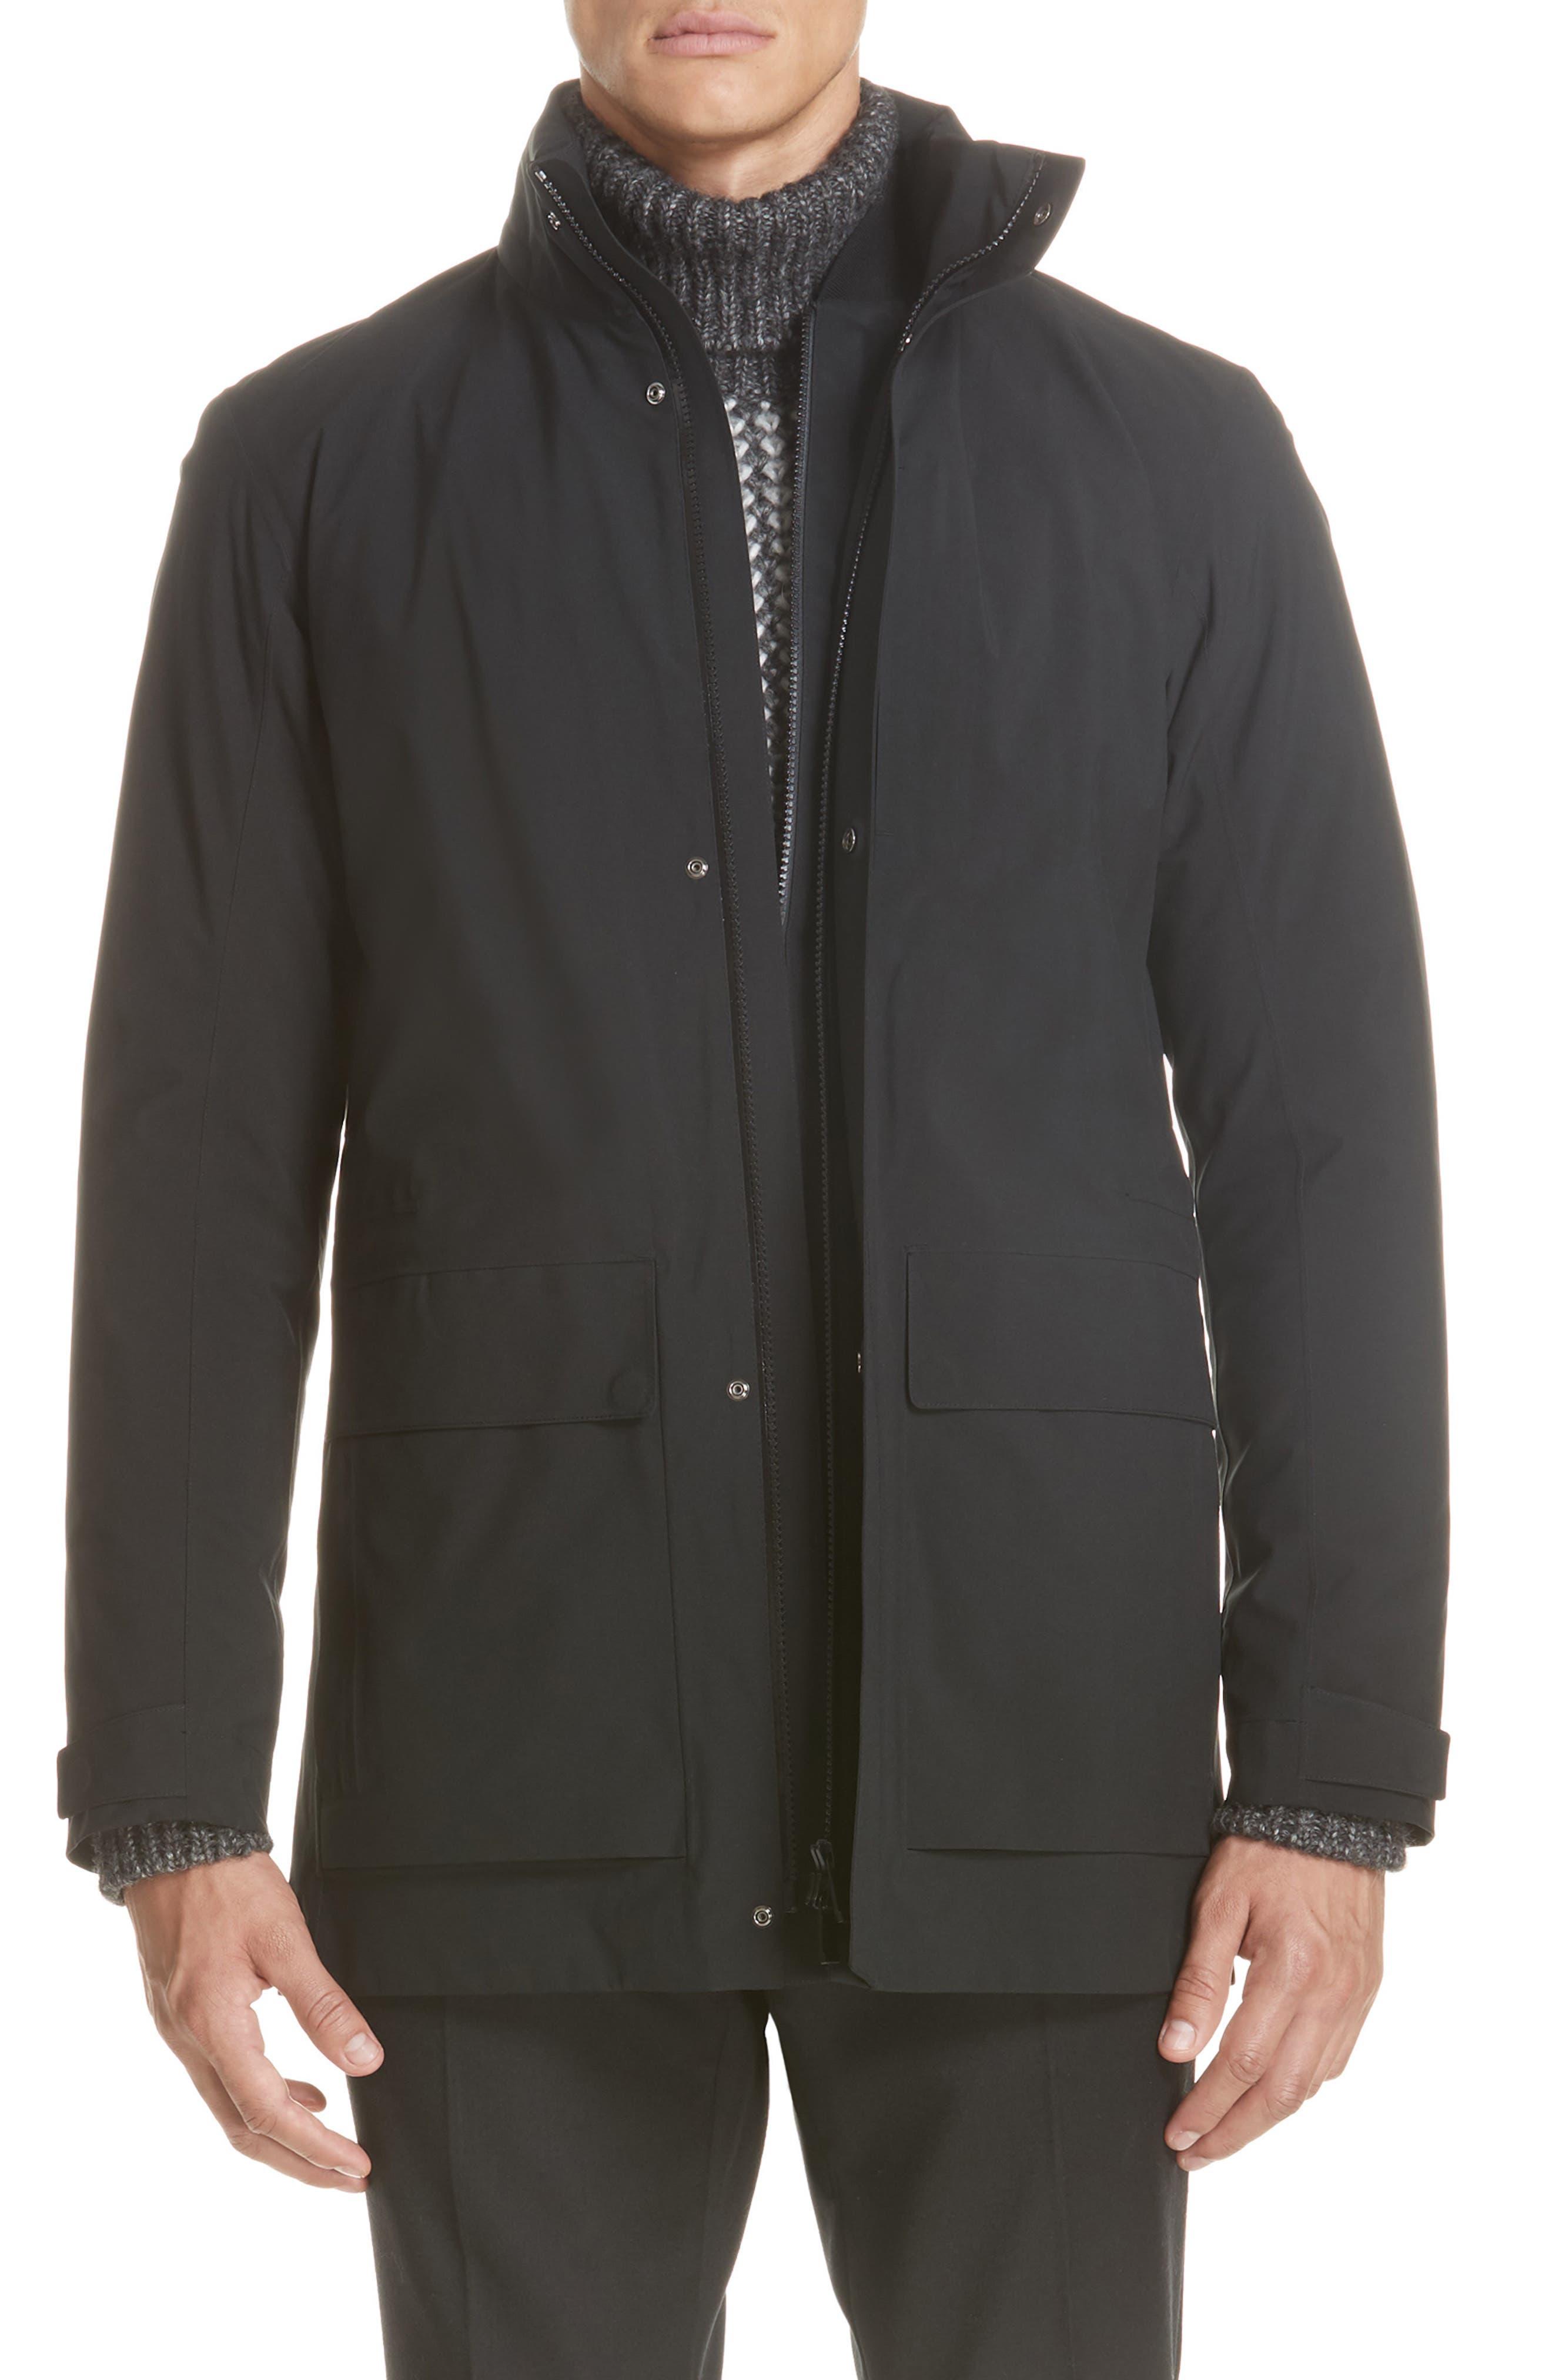 Z Zenga Trim Fit 3-in-1 Jacket,                         Main,                         color, BLACK